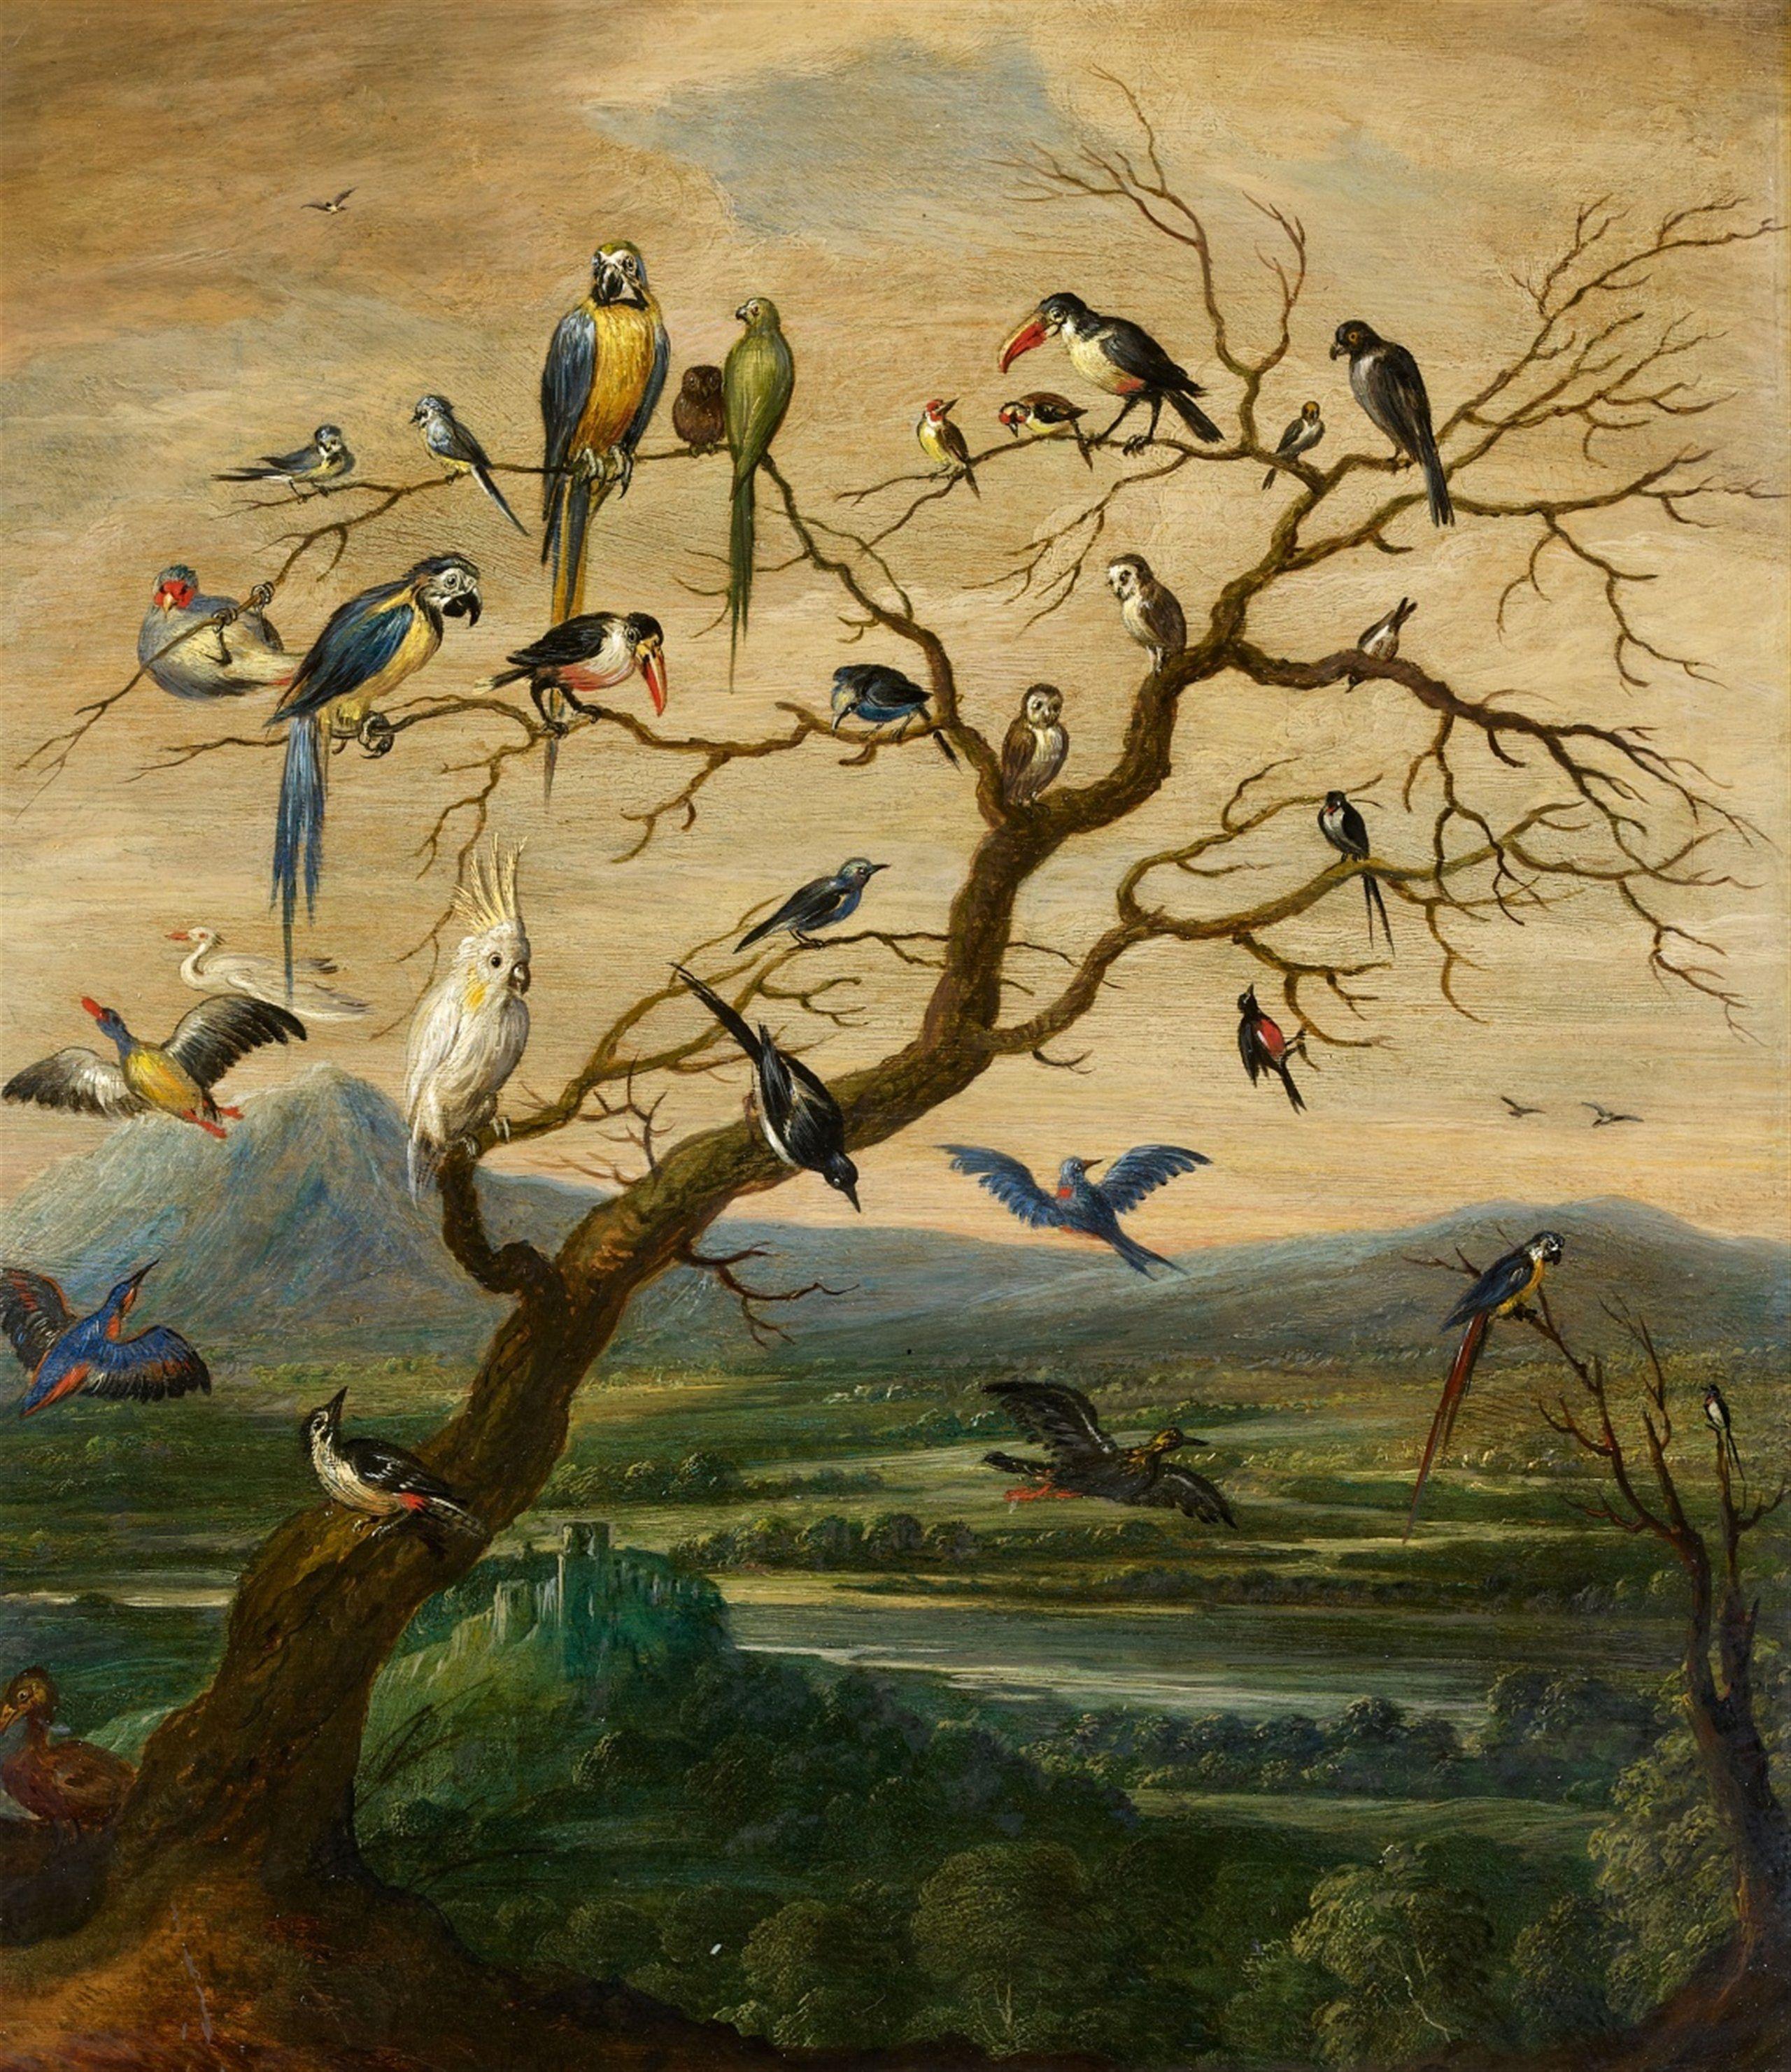 Flemish School, 17th century, Birds in a Tree before a Landscape, Oil on panel (parquetted). 41 x 36.5 cm.   Bird art, Tree illustration, Animal art